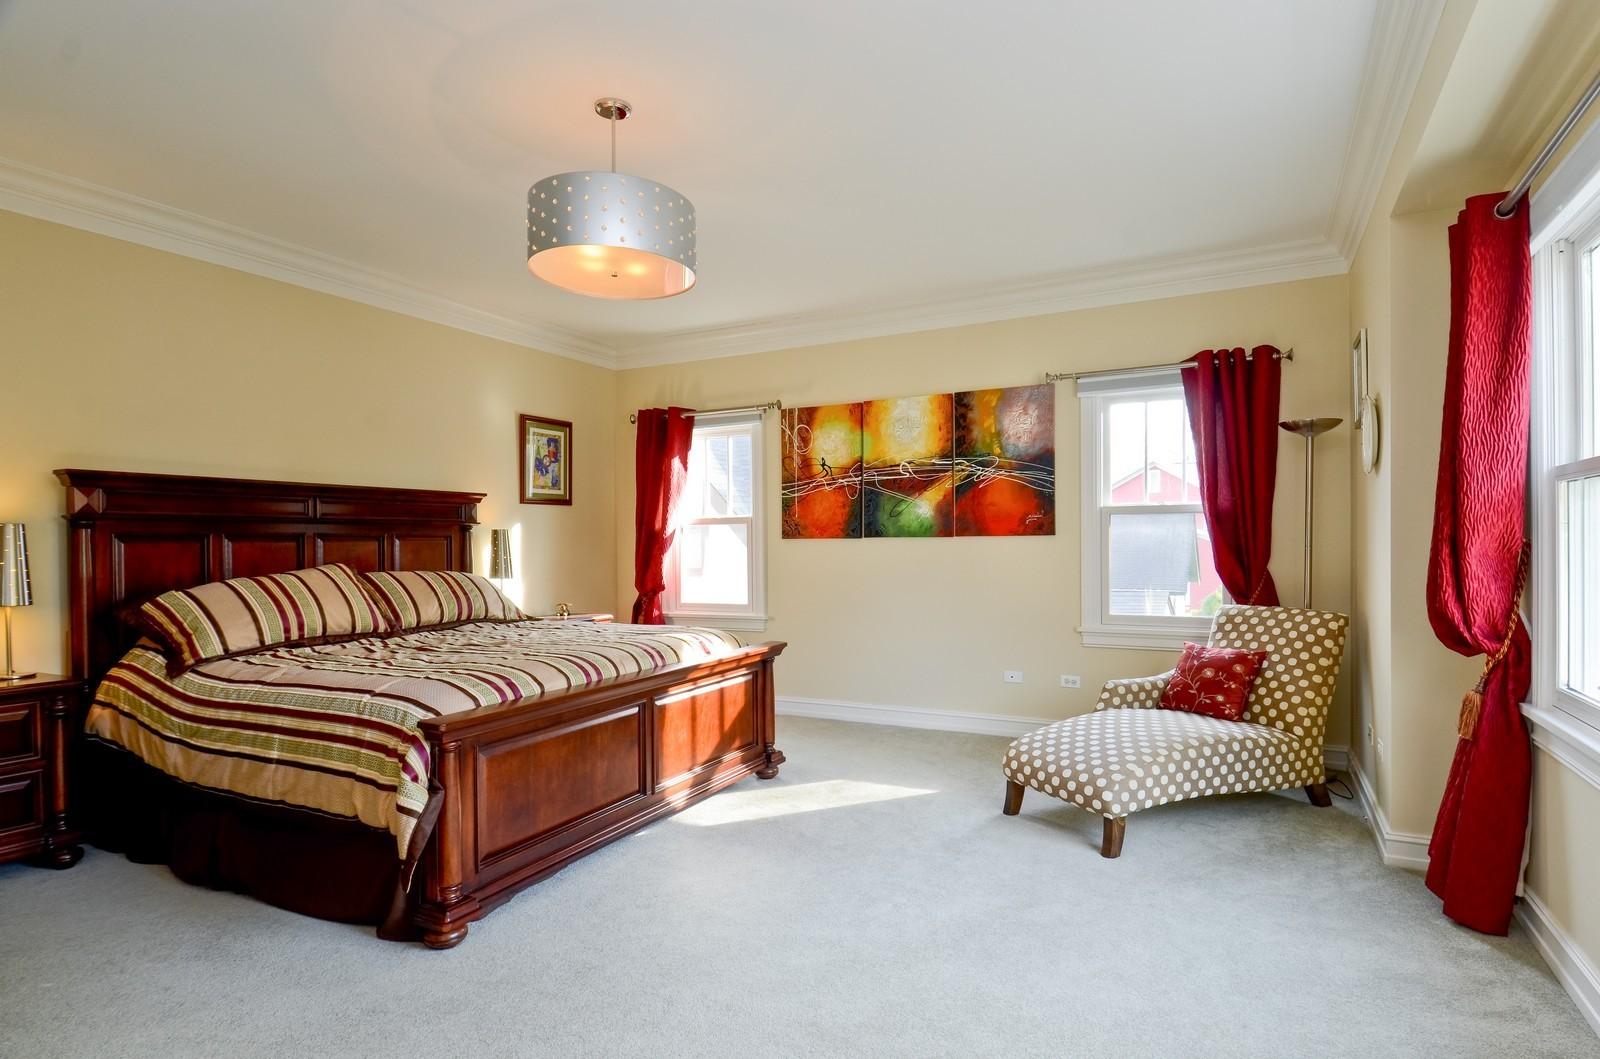 Real Estate Photography - 738 Western Ave., Glen Ellyn, IL, 60137 - Master Bedroom